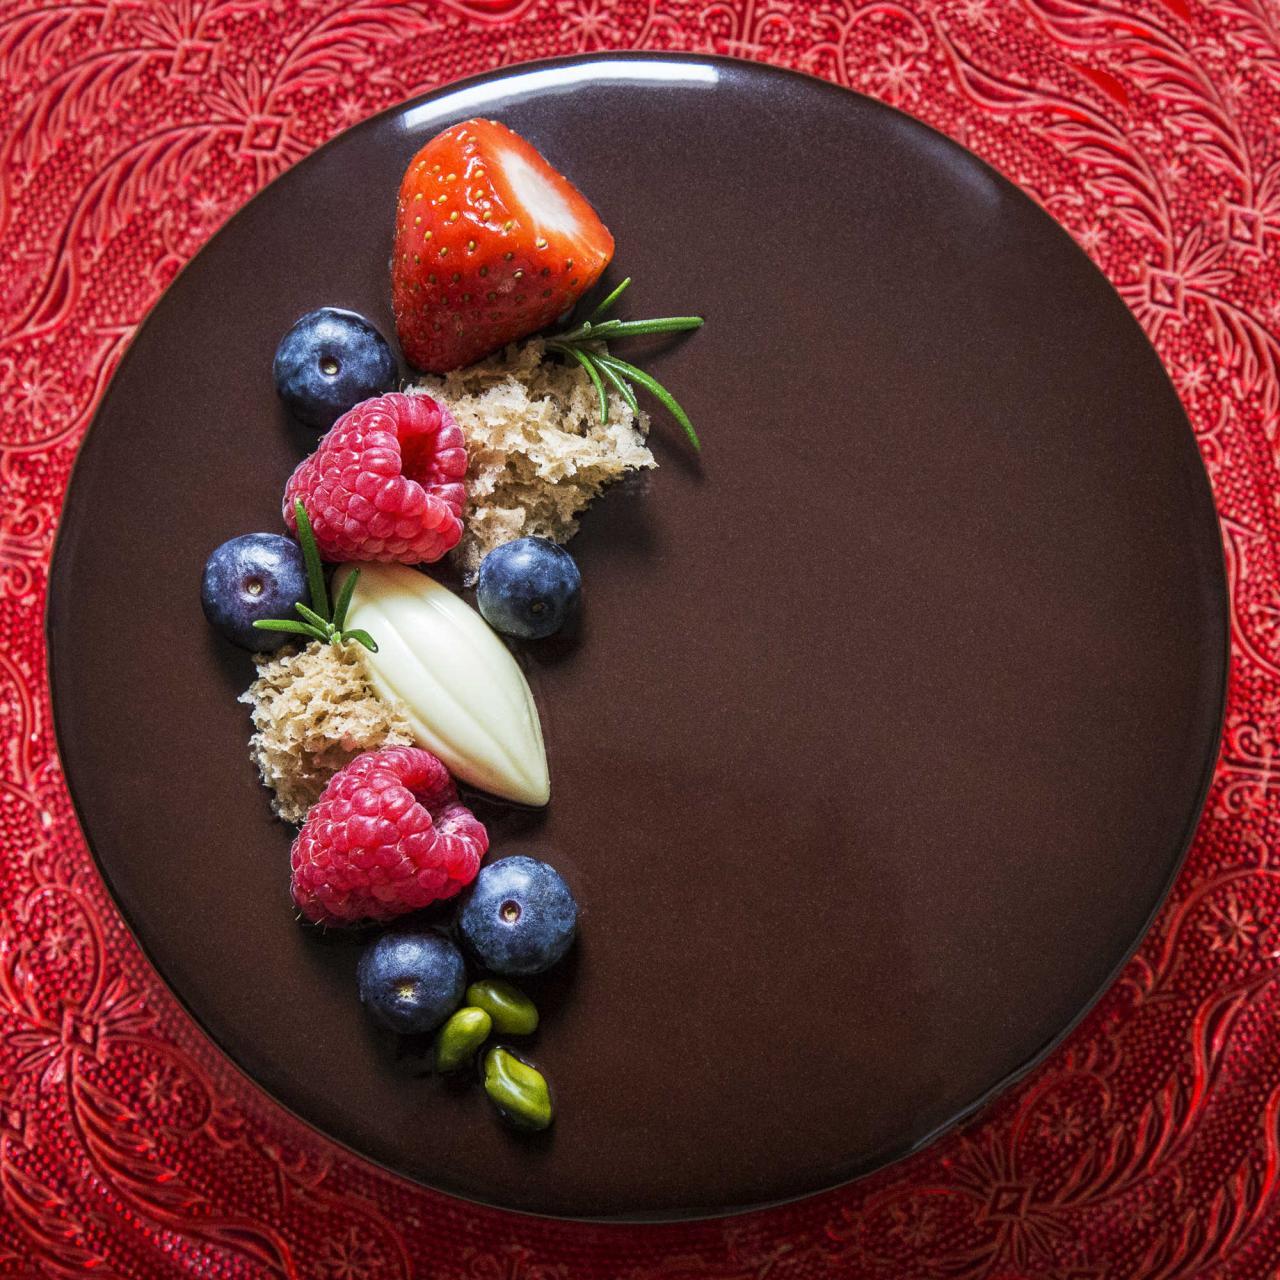 Chocolate cake by Helen Vass. Photo: Debbie Pipe